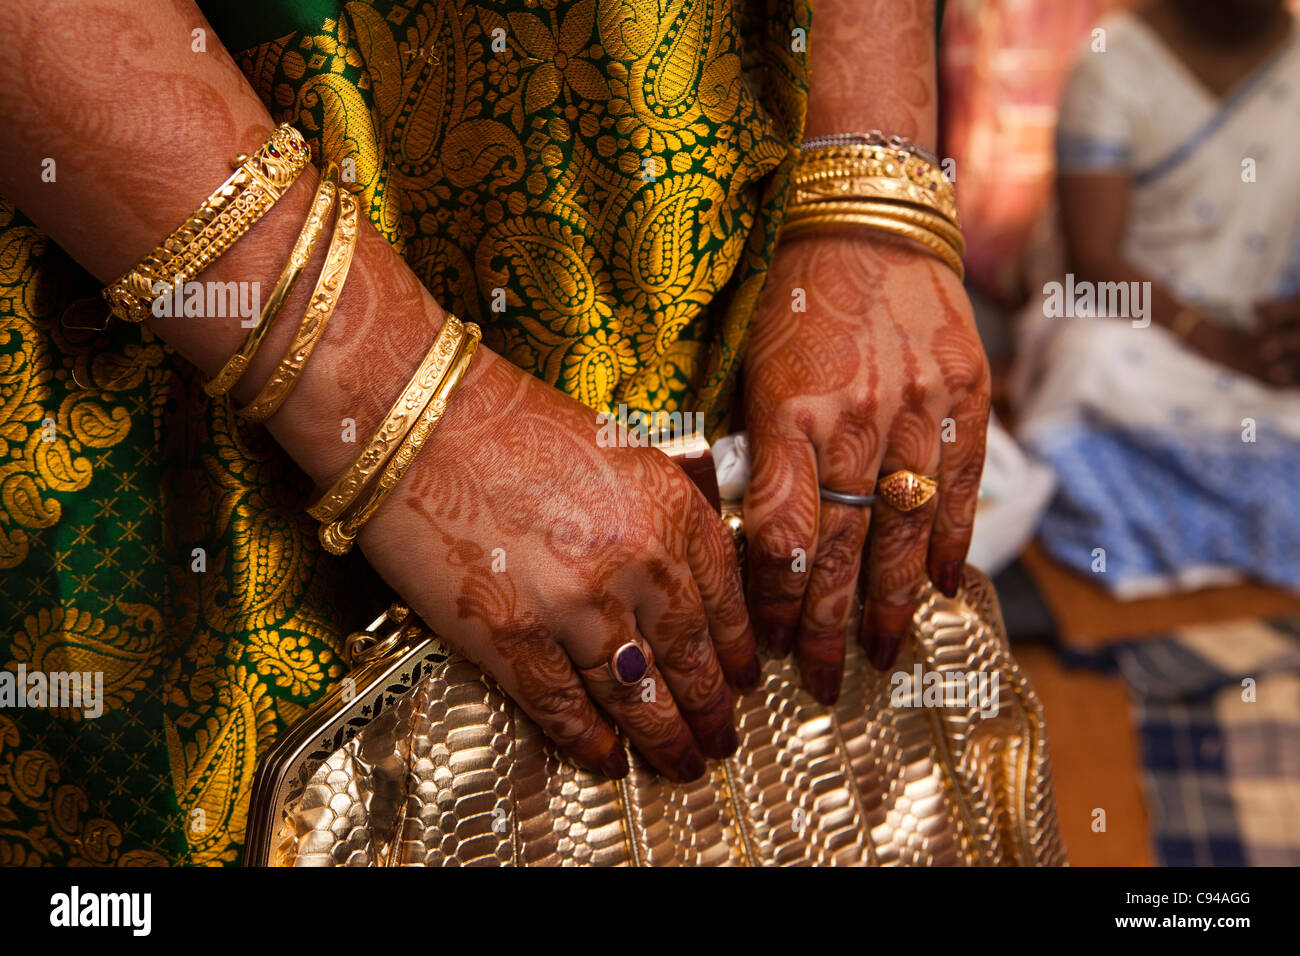 India assam guwahati weddings mehndi traditional henna india assam guwahati weddings mehndi traditional henna decorative patterns on hands of bride junglespirit Choice Image